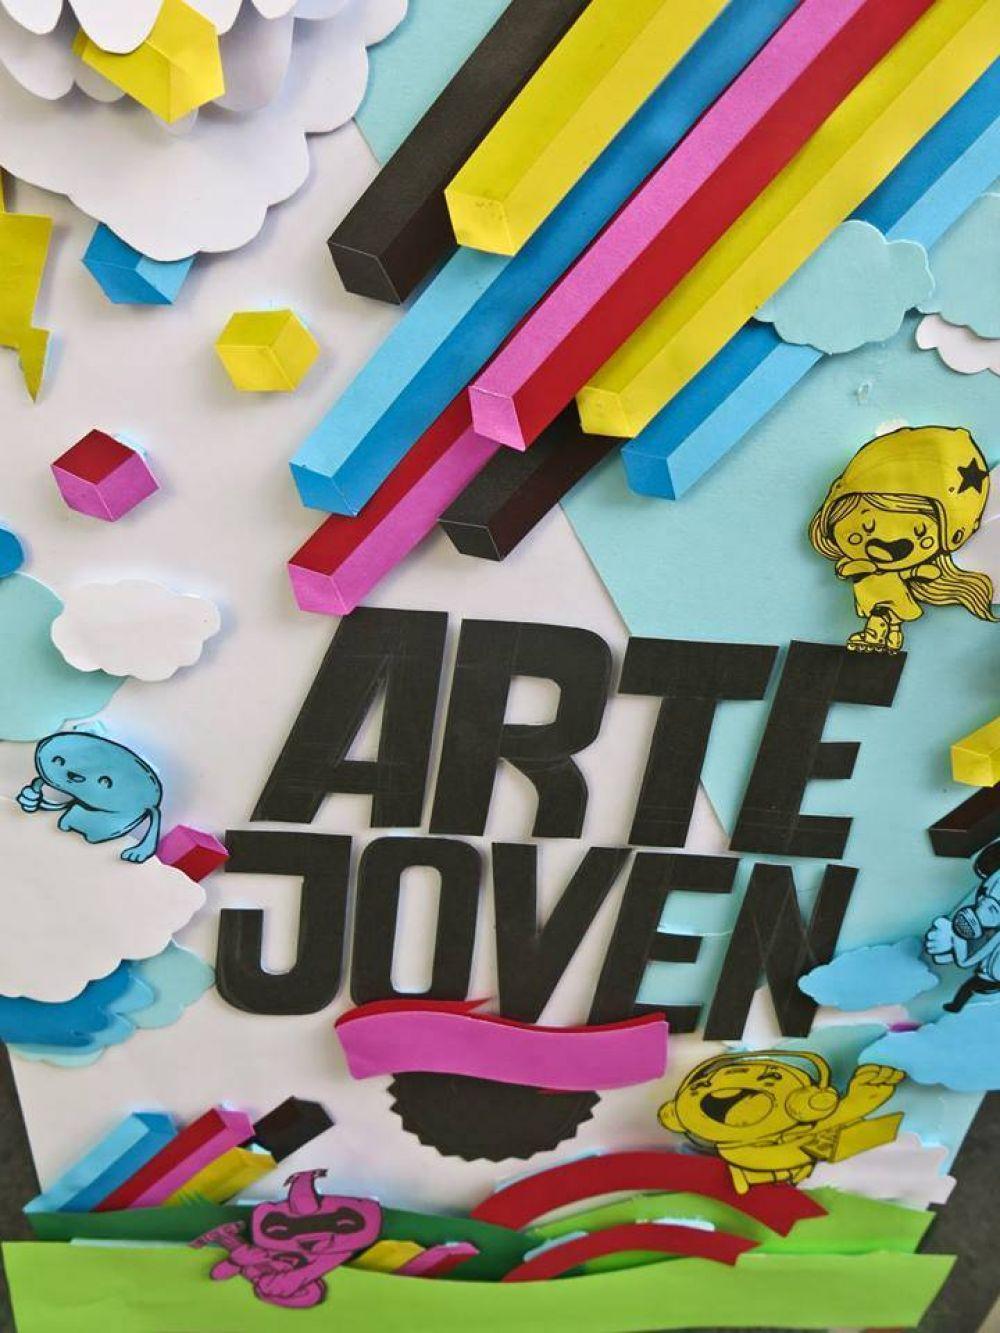 La Plata: Festival de Arte Joven 2013 en el Pasaje Dardo Rocha este fin de semana